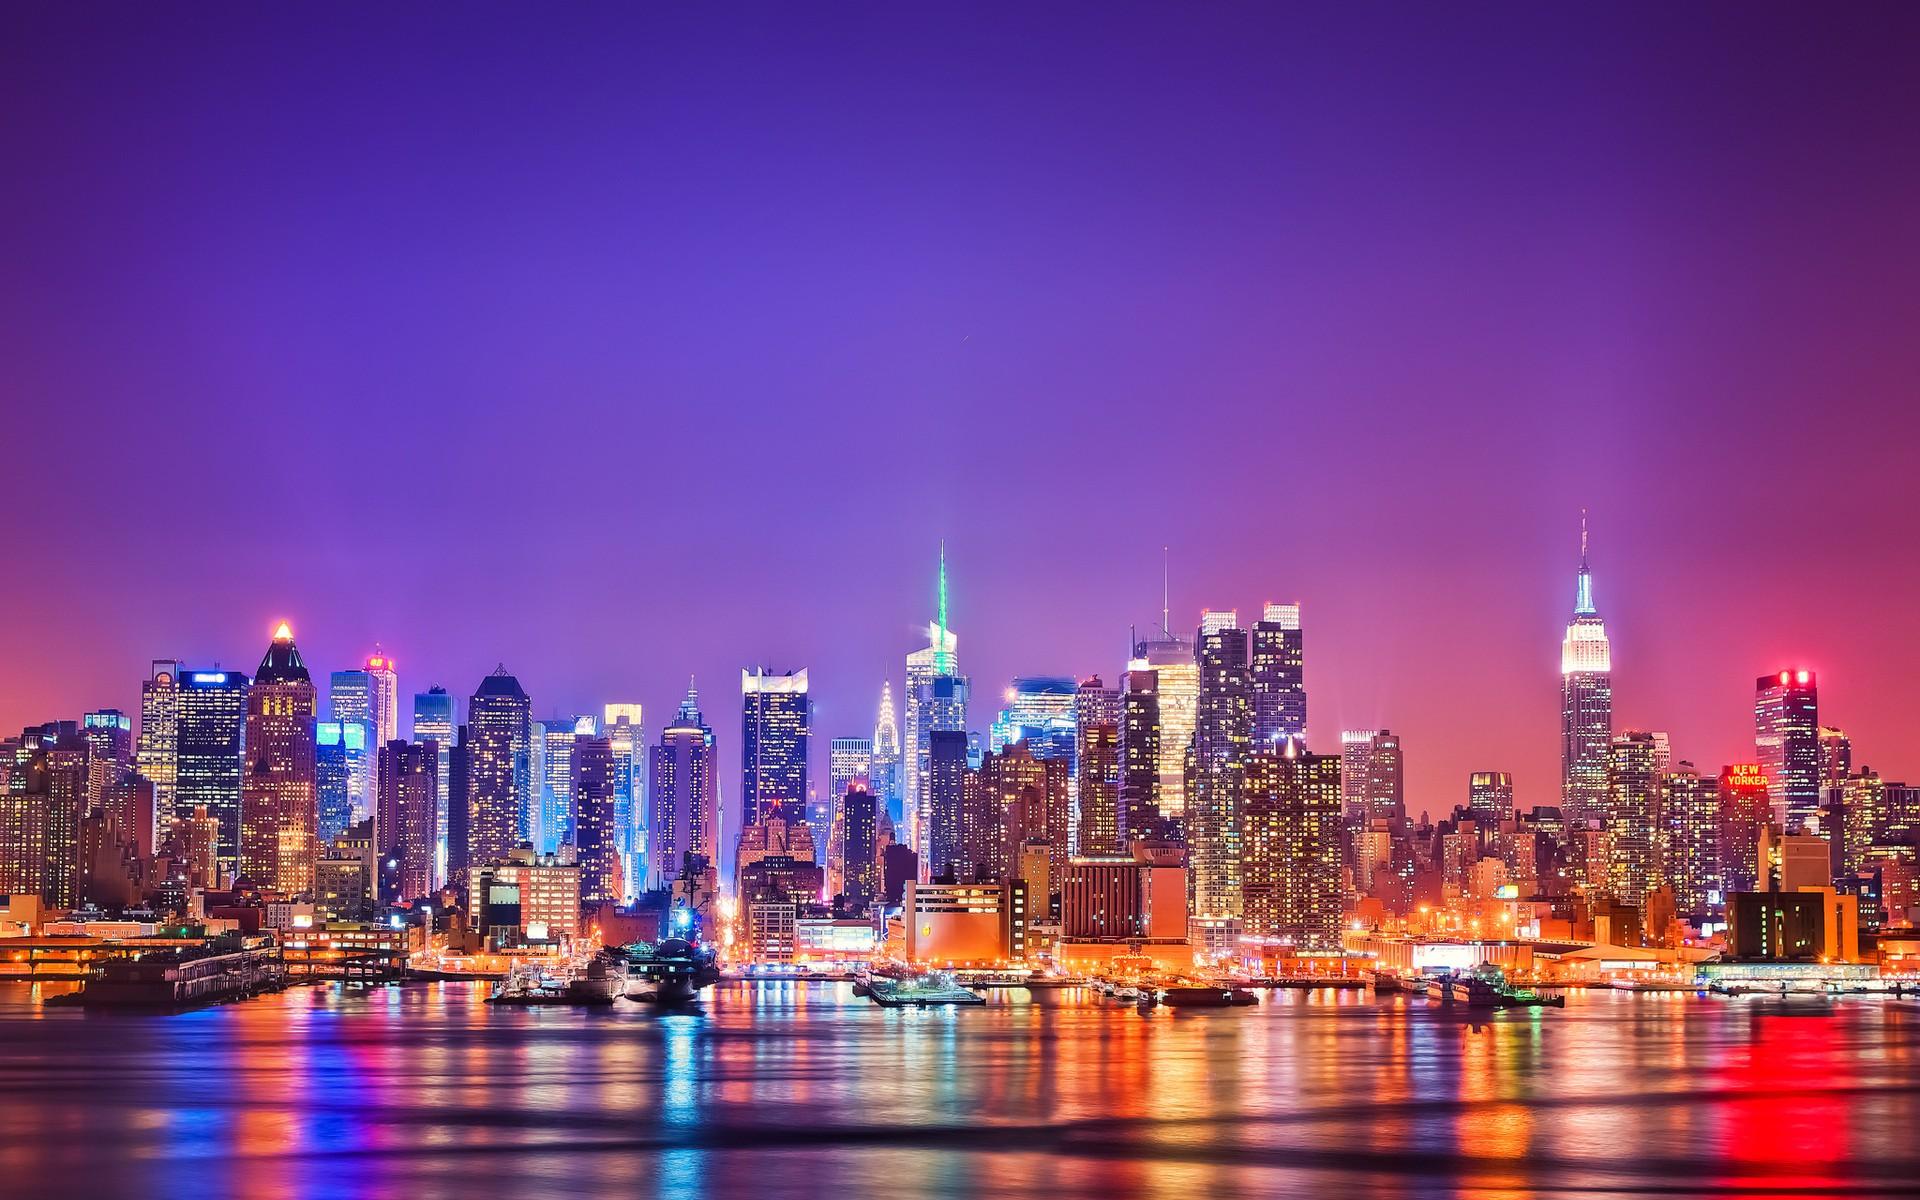 skyline-01-new-york-city.jpg